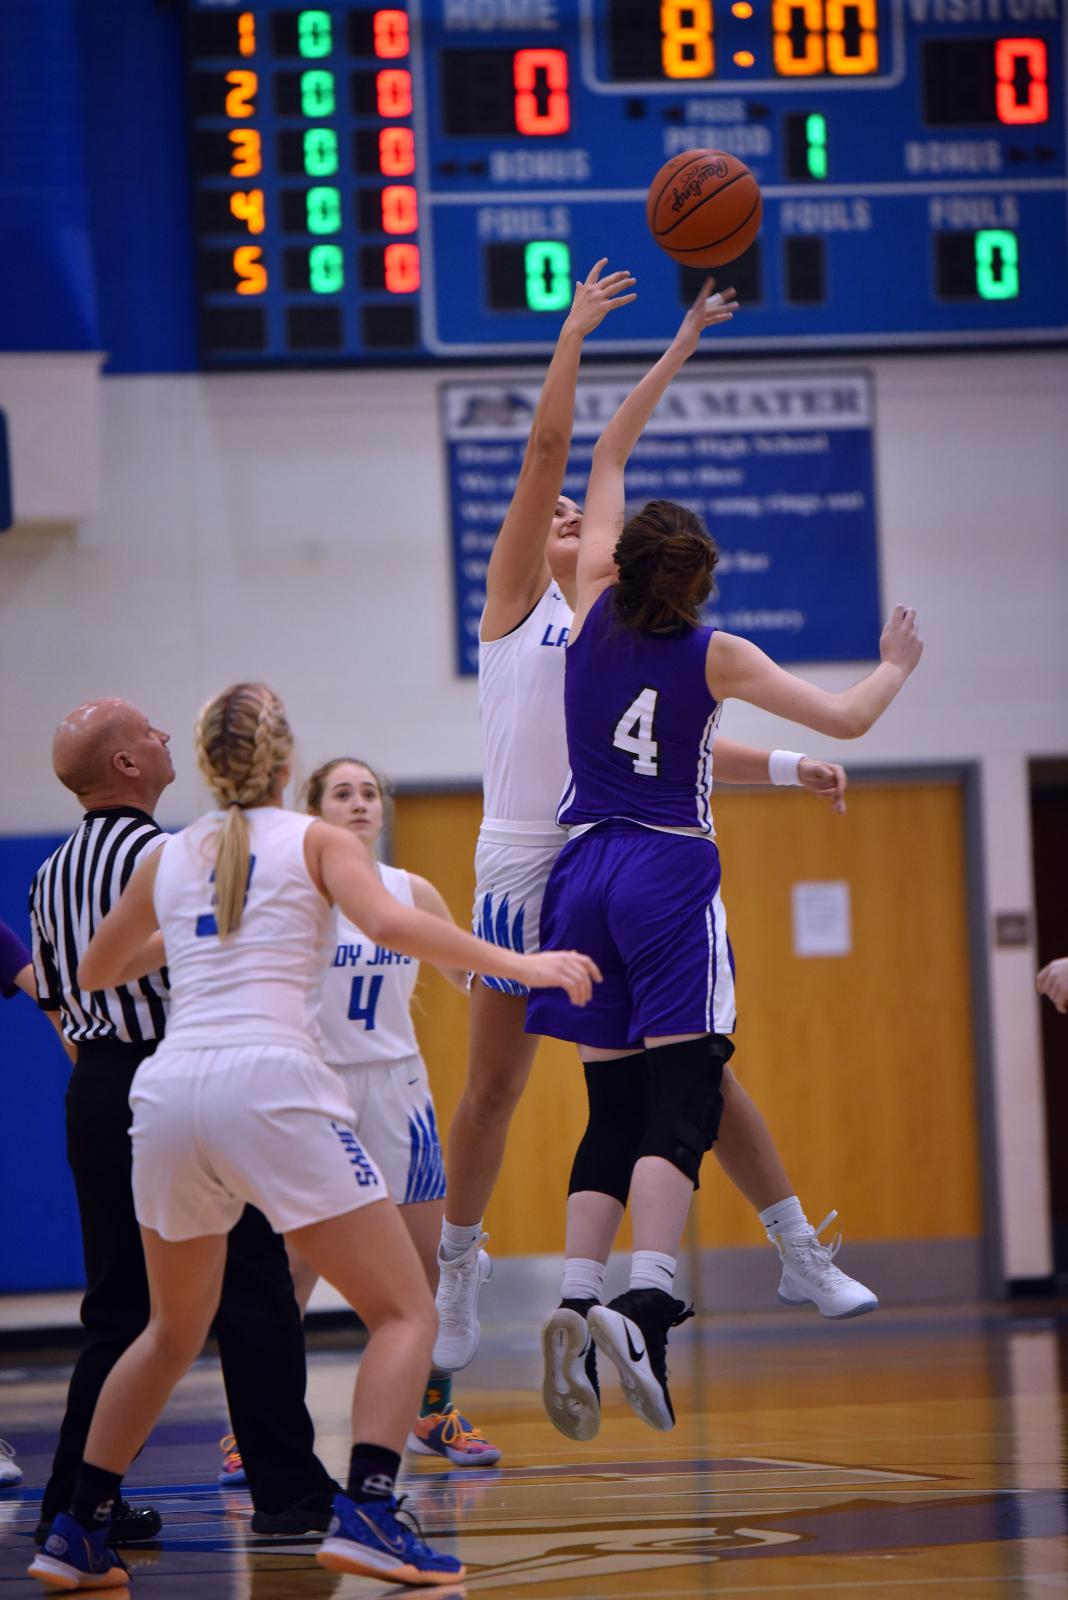 Girl's High School Basketball Jan. 16, 2021